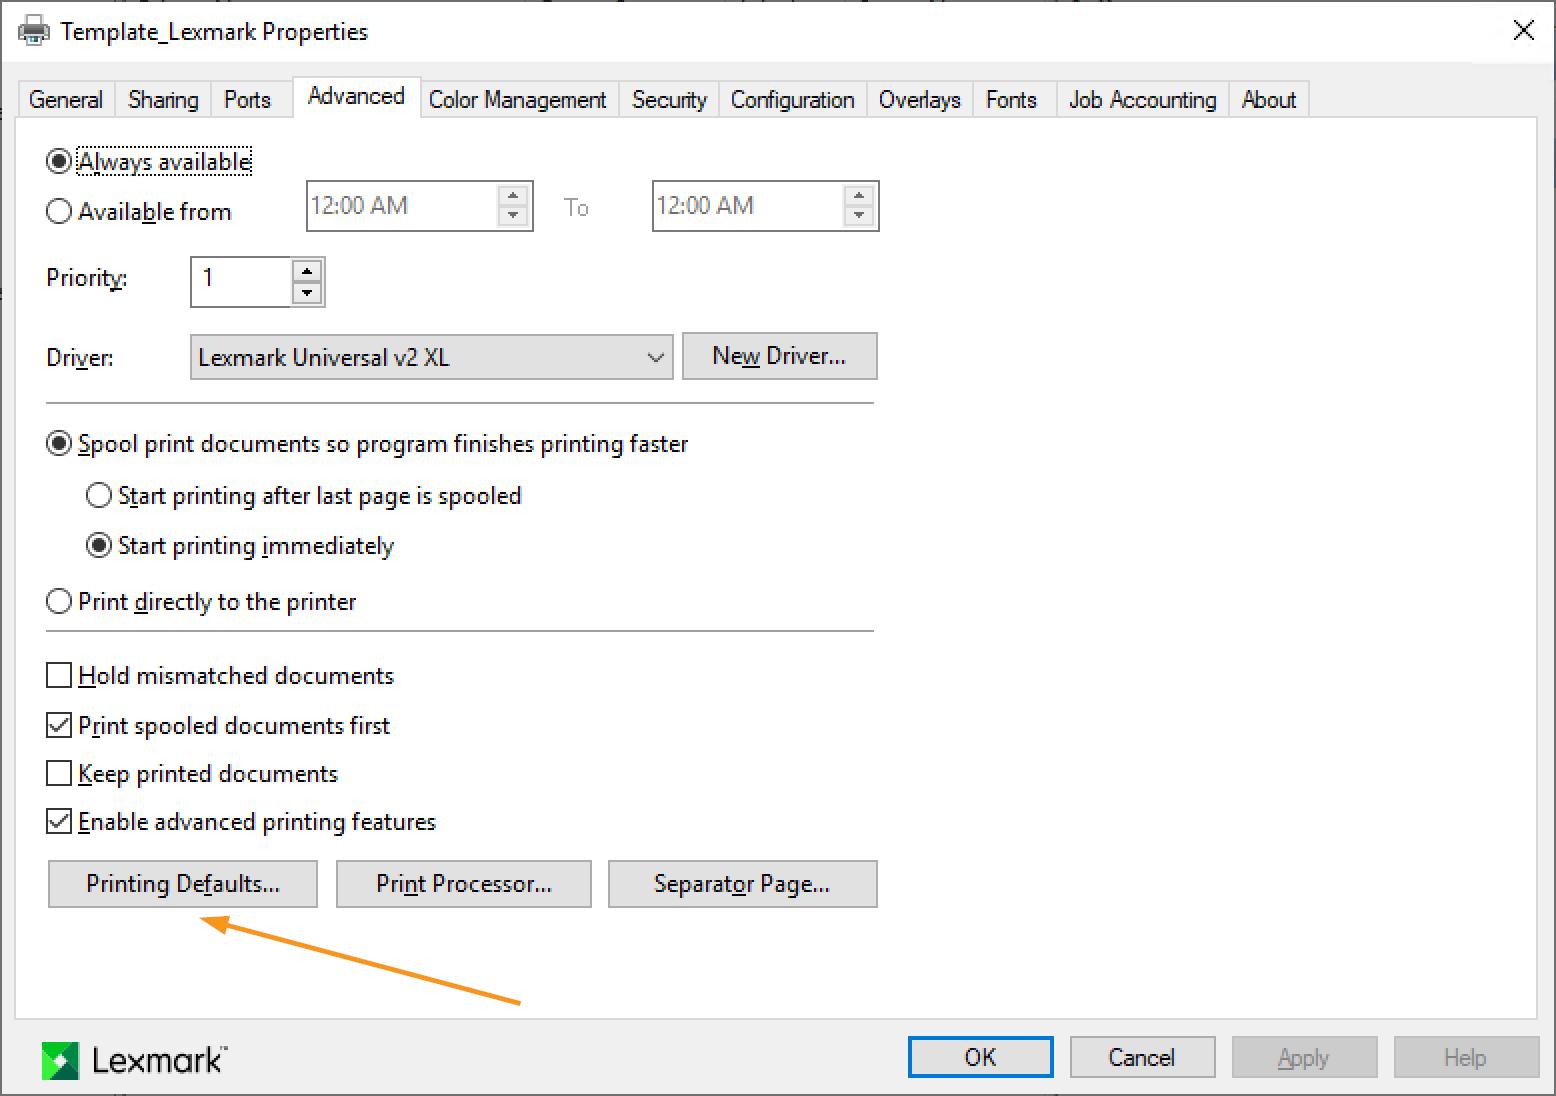 Apply Printing Defaults